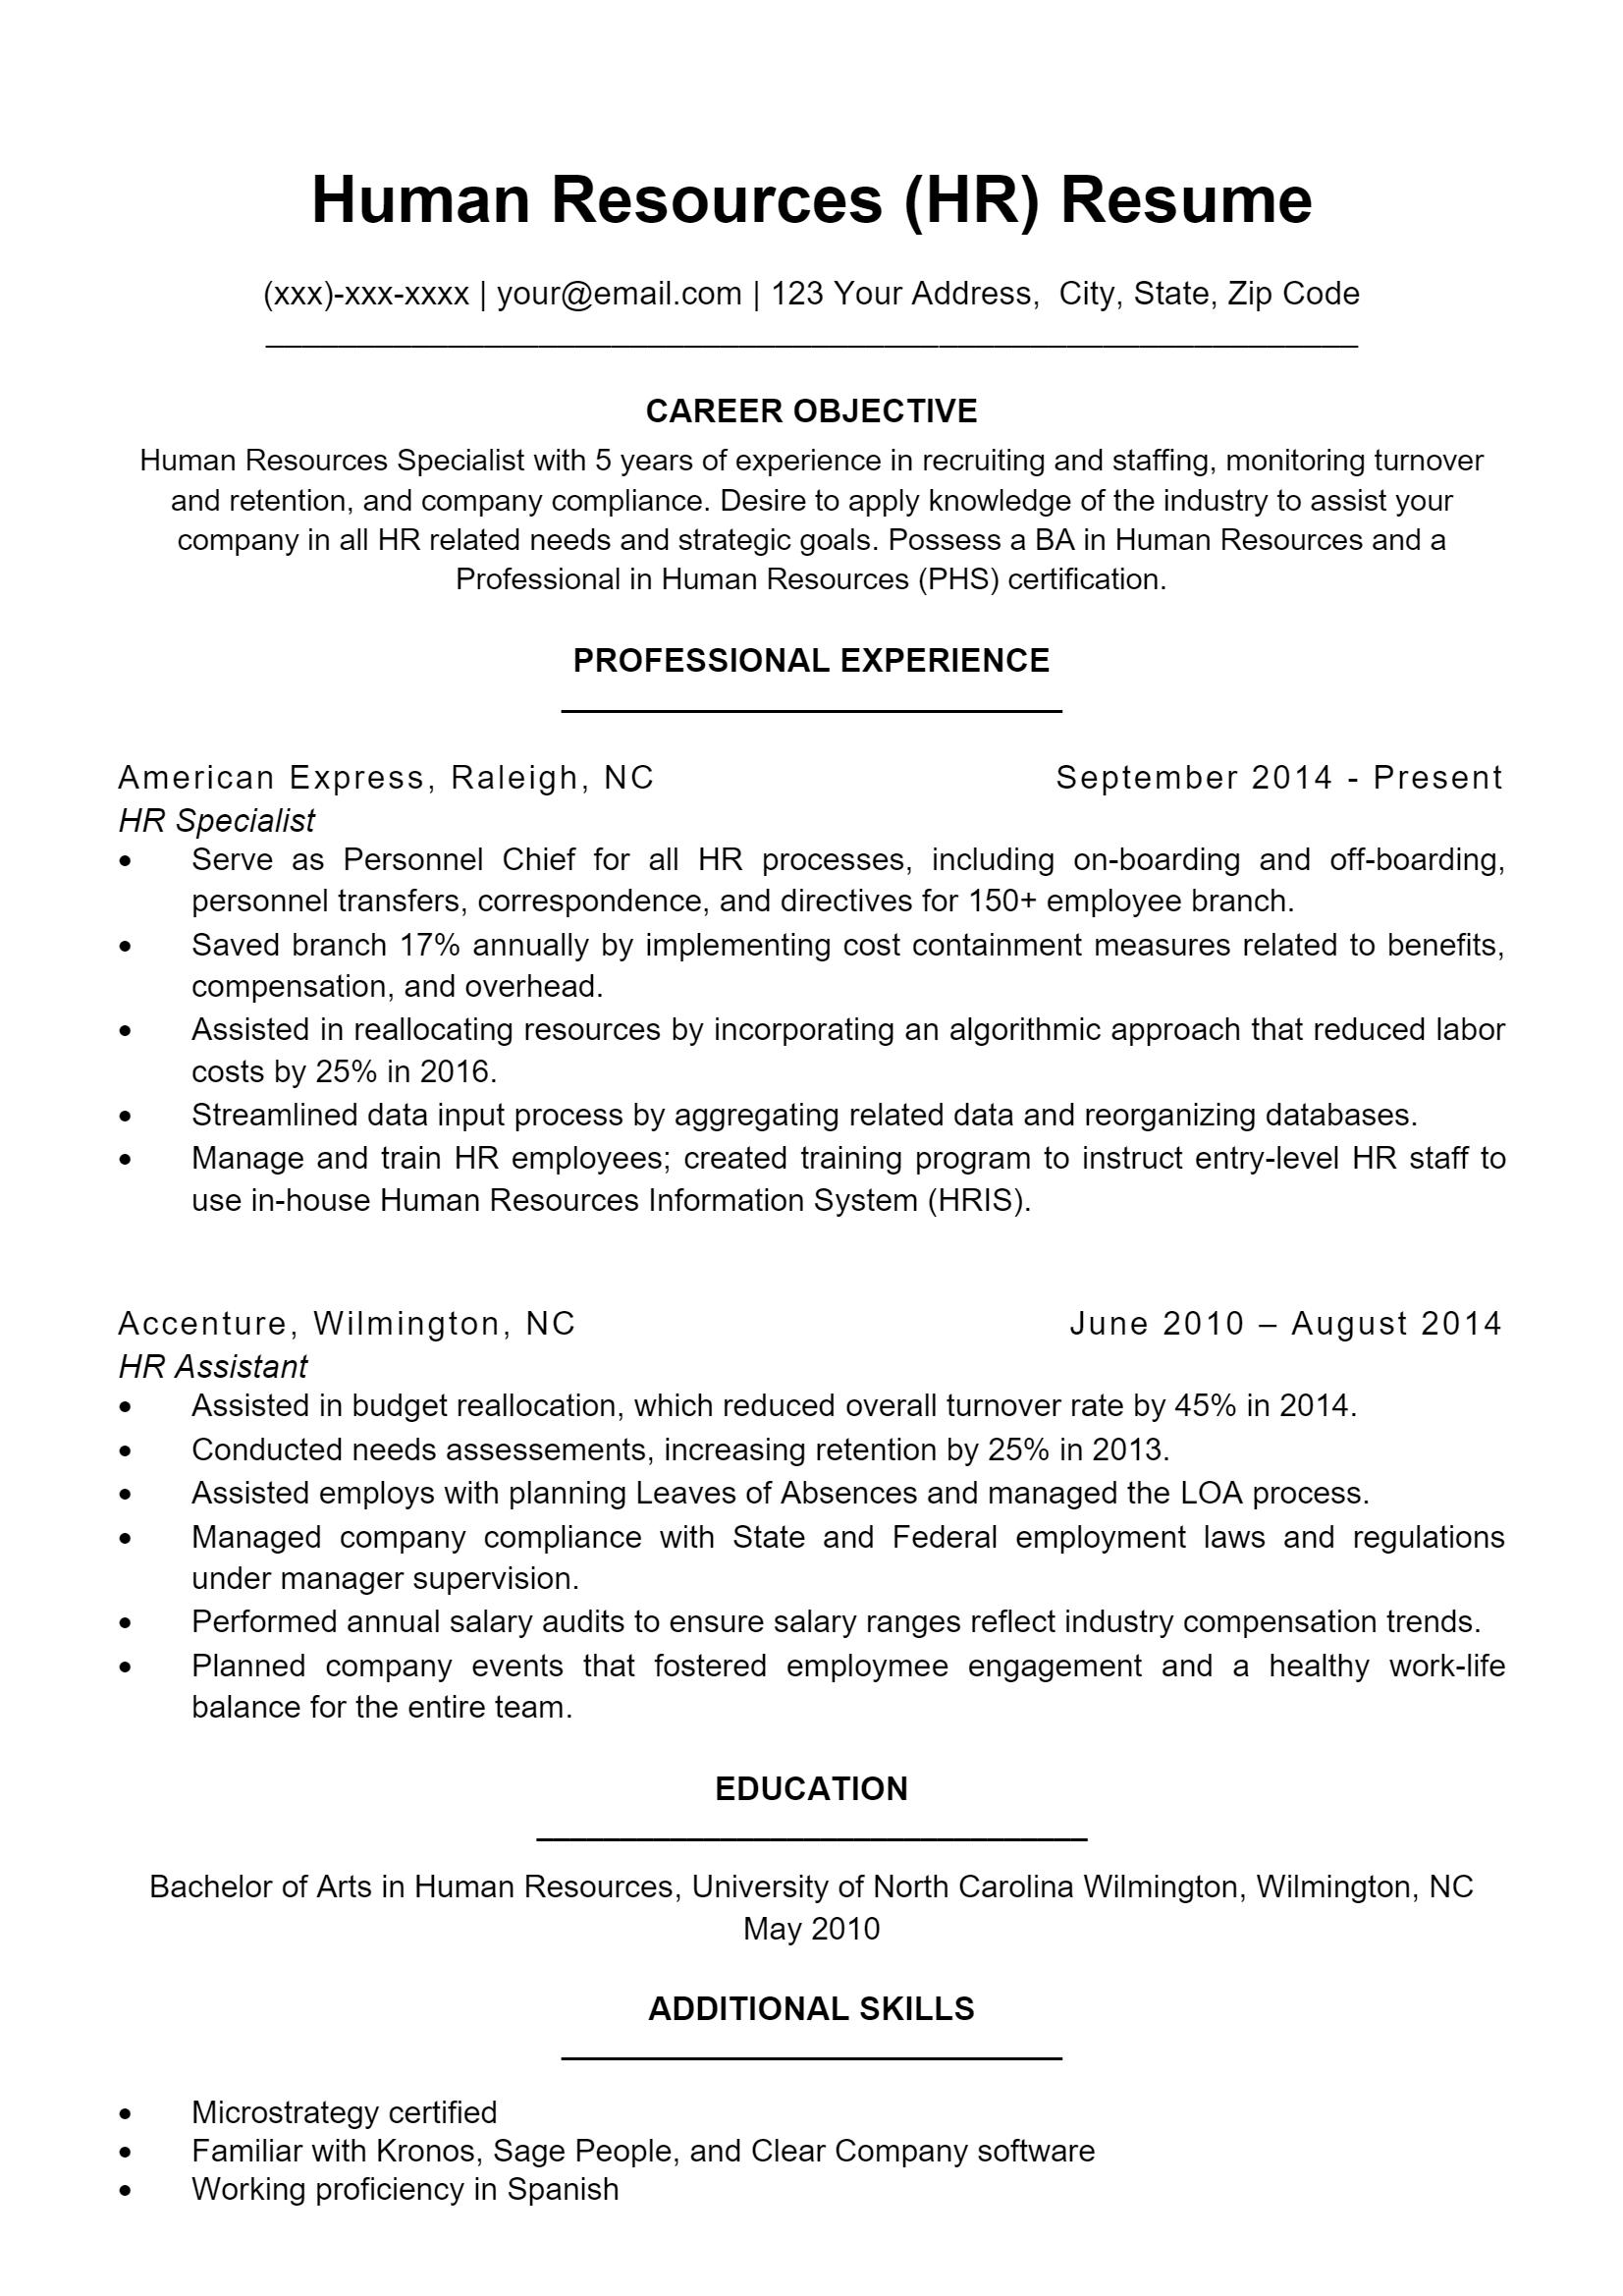 Human Resources Resume > Human Resources Resume .Docx (Word)